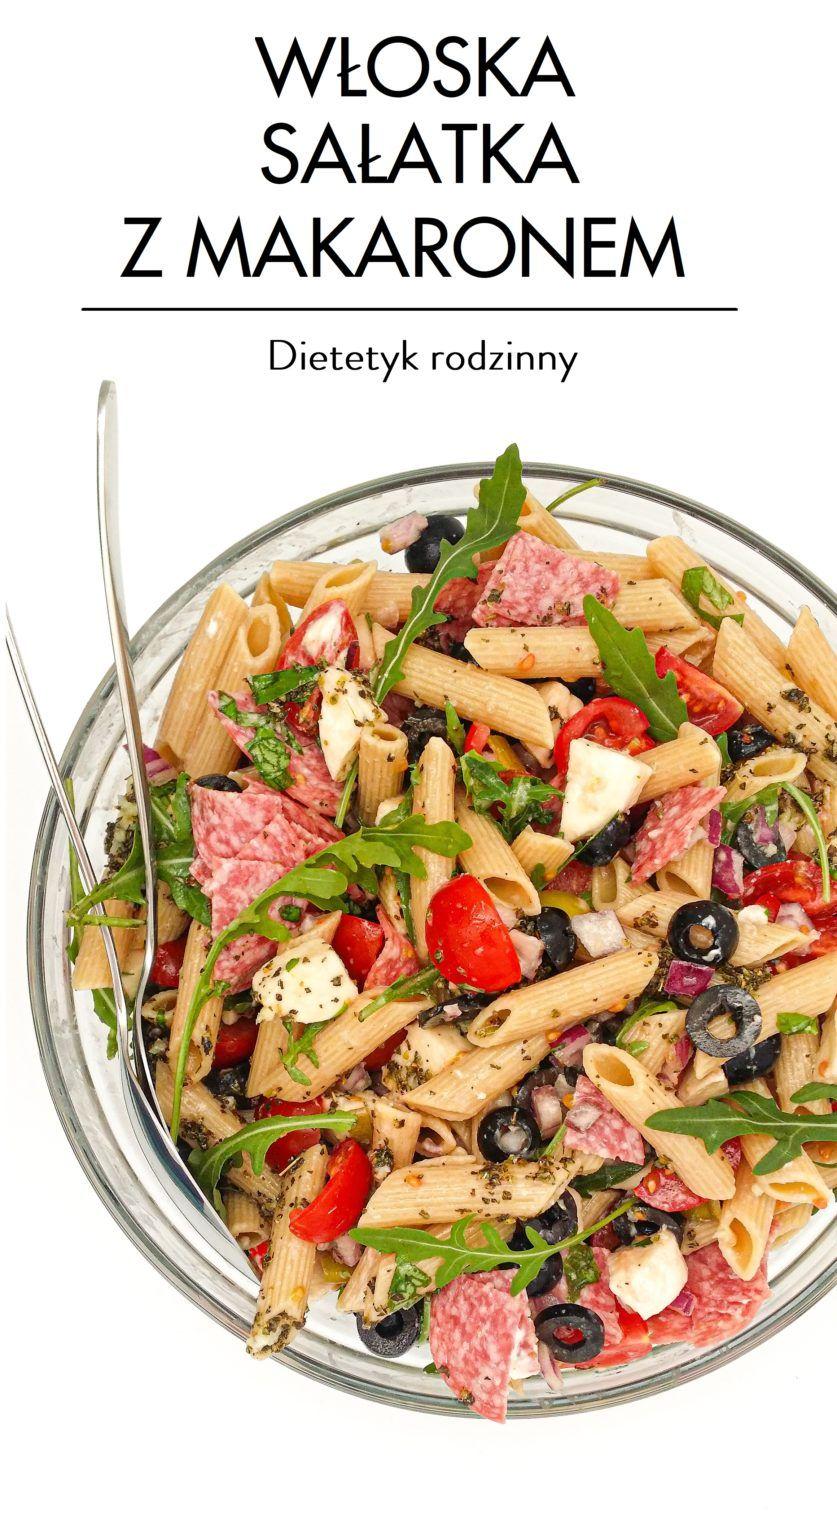 Wloska Salatka Z Makaronem Recipe Food Workout Food Healthy Recipes